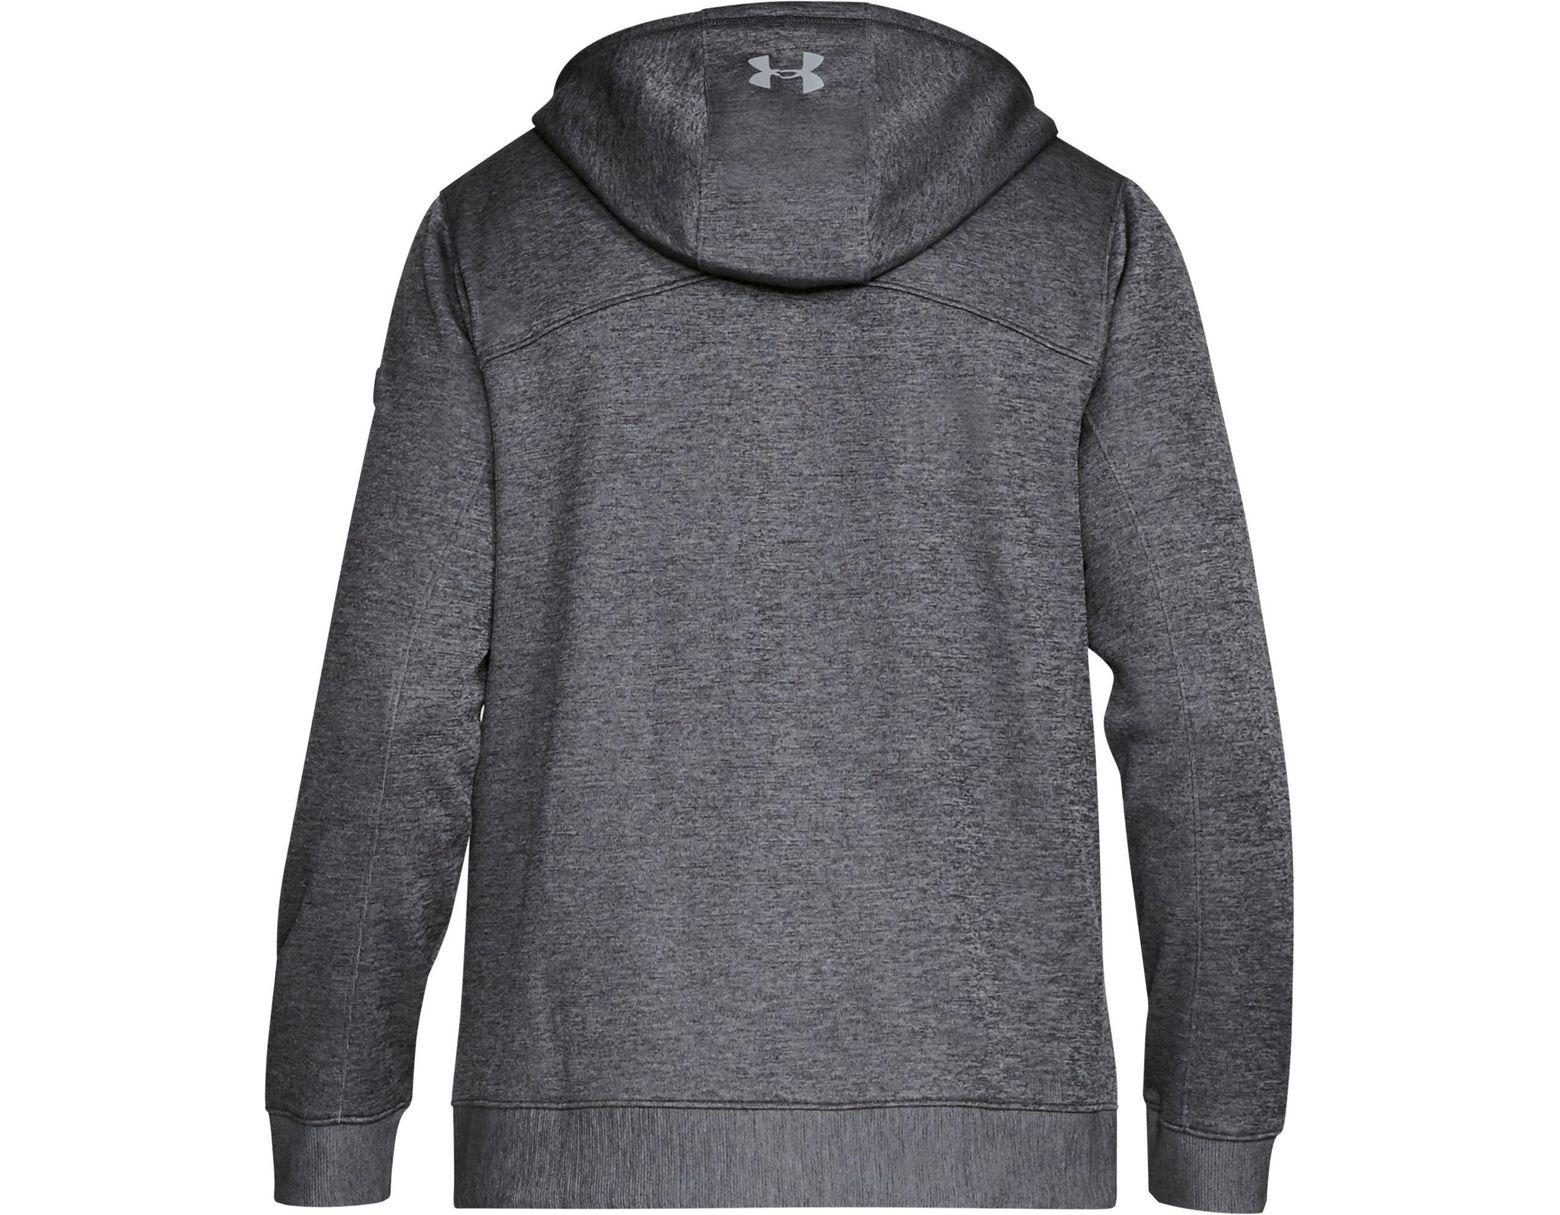 26f039e9 Under Armour Sportstyle Sweater Fleece Full-zip Long Sleeve T-shirt in Gray  for Men - Lyst